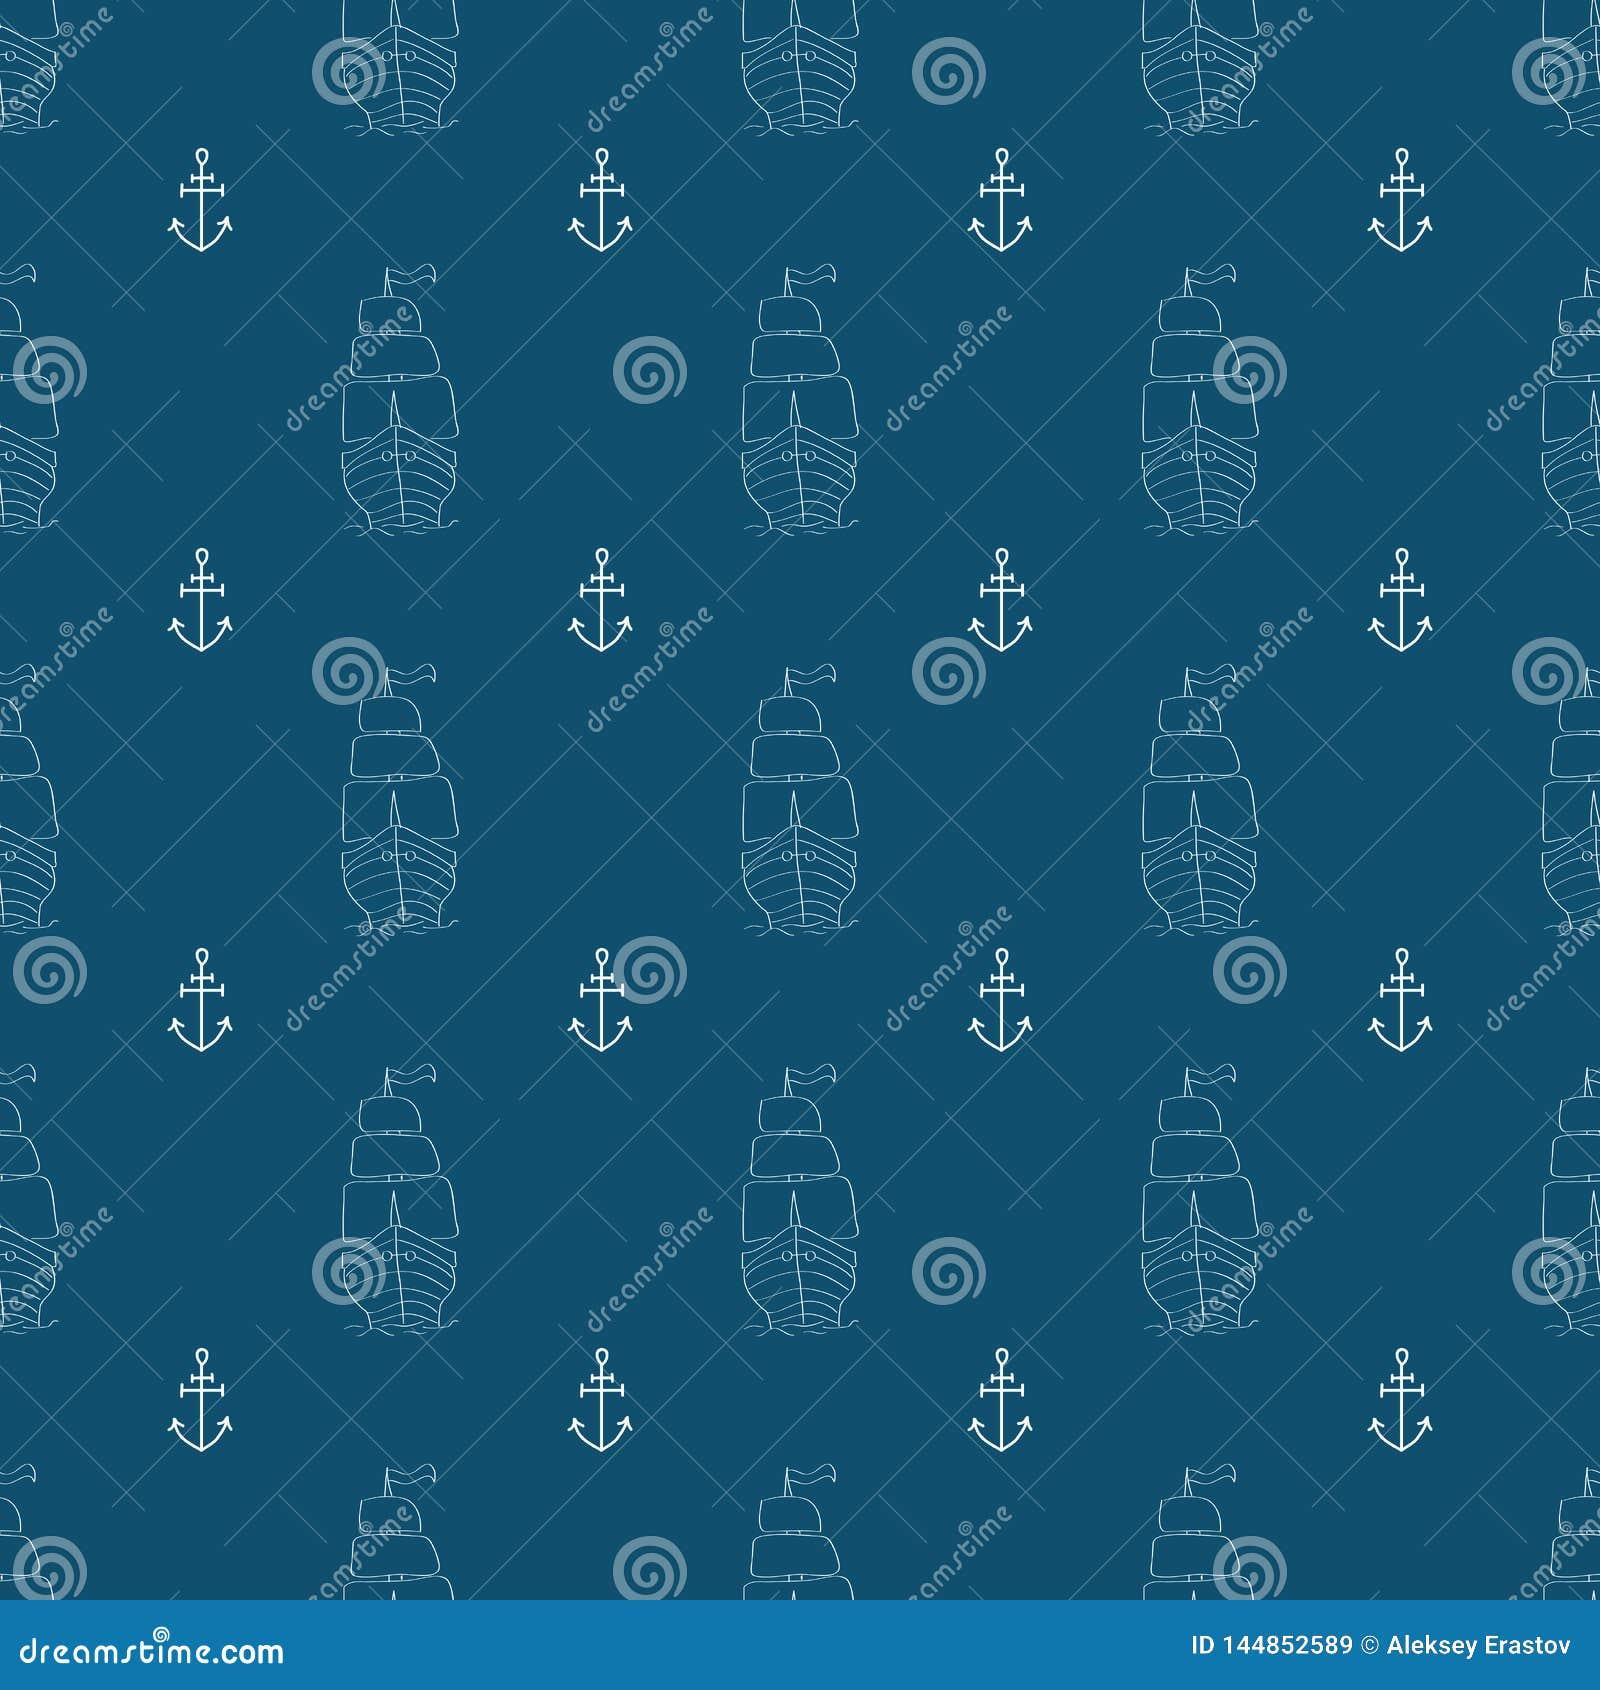 Marine seamless pattern. Doodle, sketch, scribbles. Vector illustration.